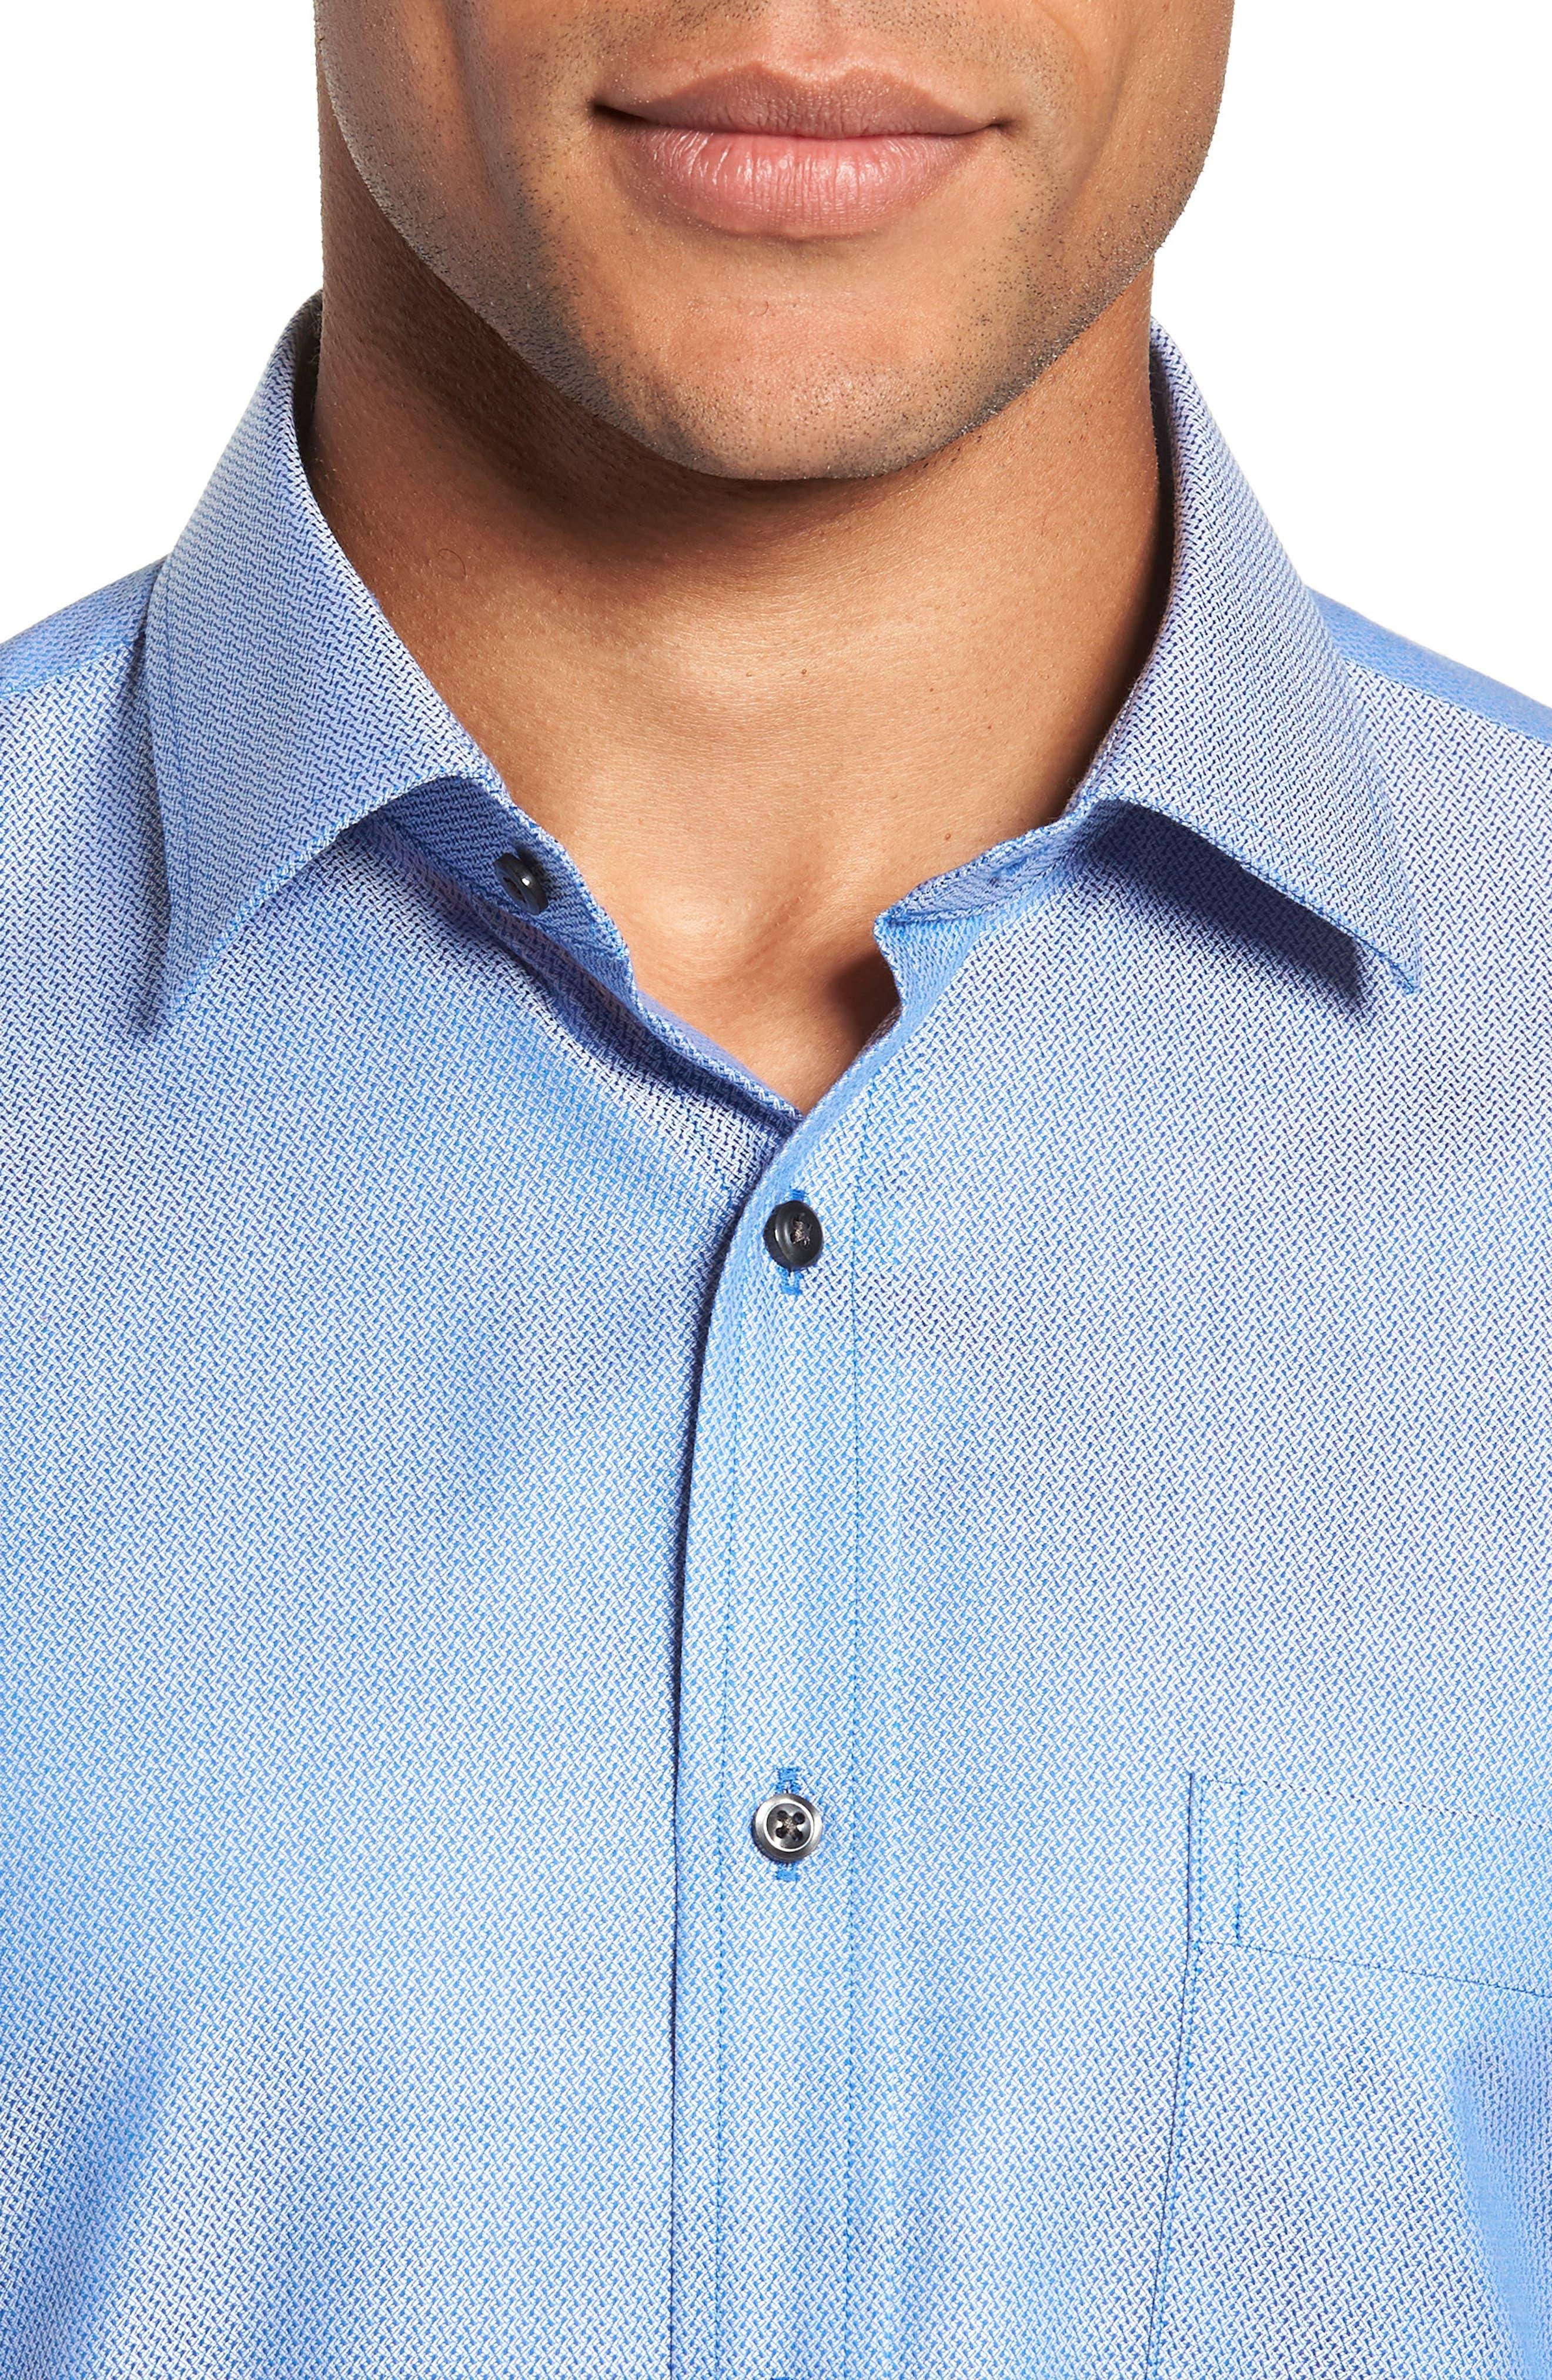 Trim Fit No-Iron Geometric Dress Shirt,                             Alternate thumbnail 2, color,                             BLUE CAMP